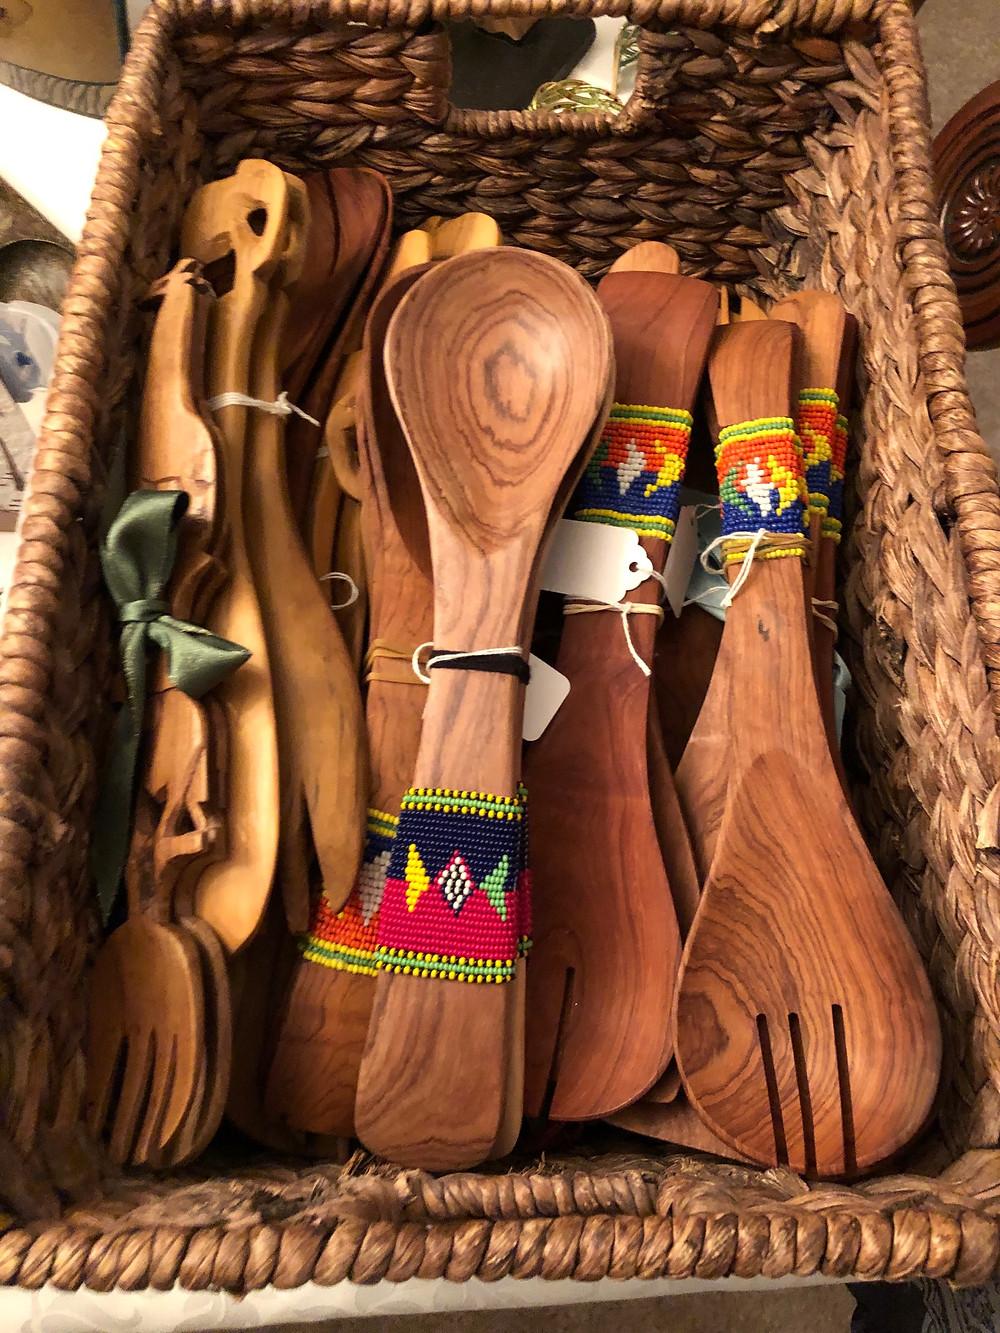 Handmade wooden spoons from Samburu